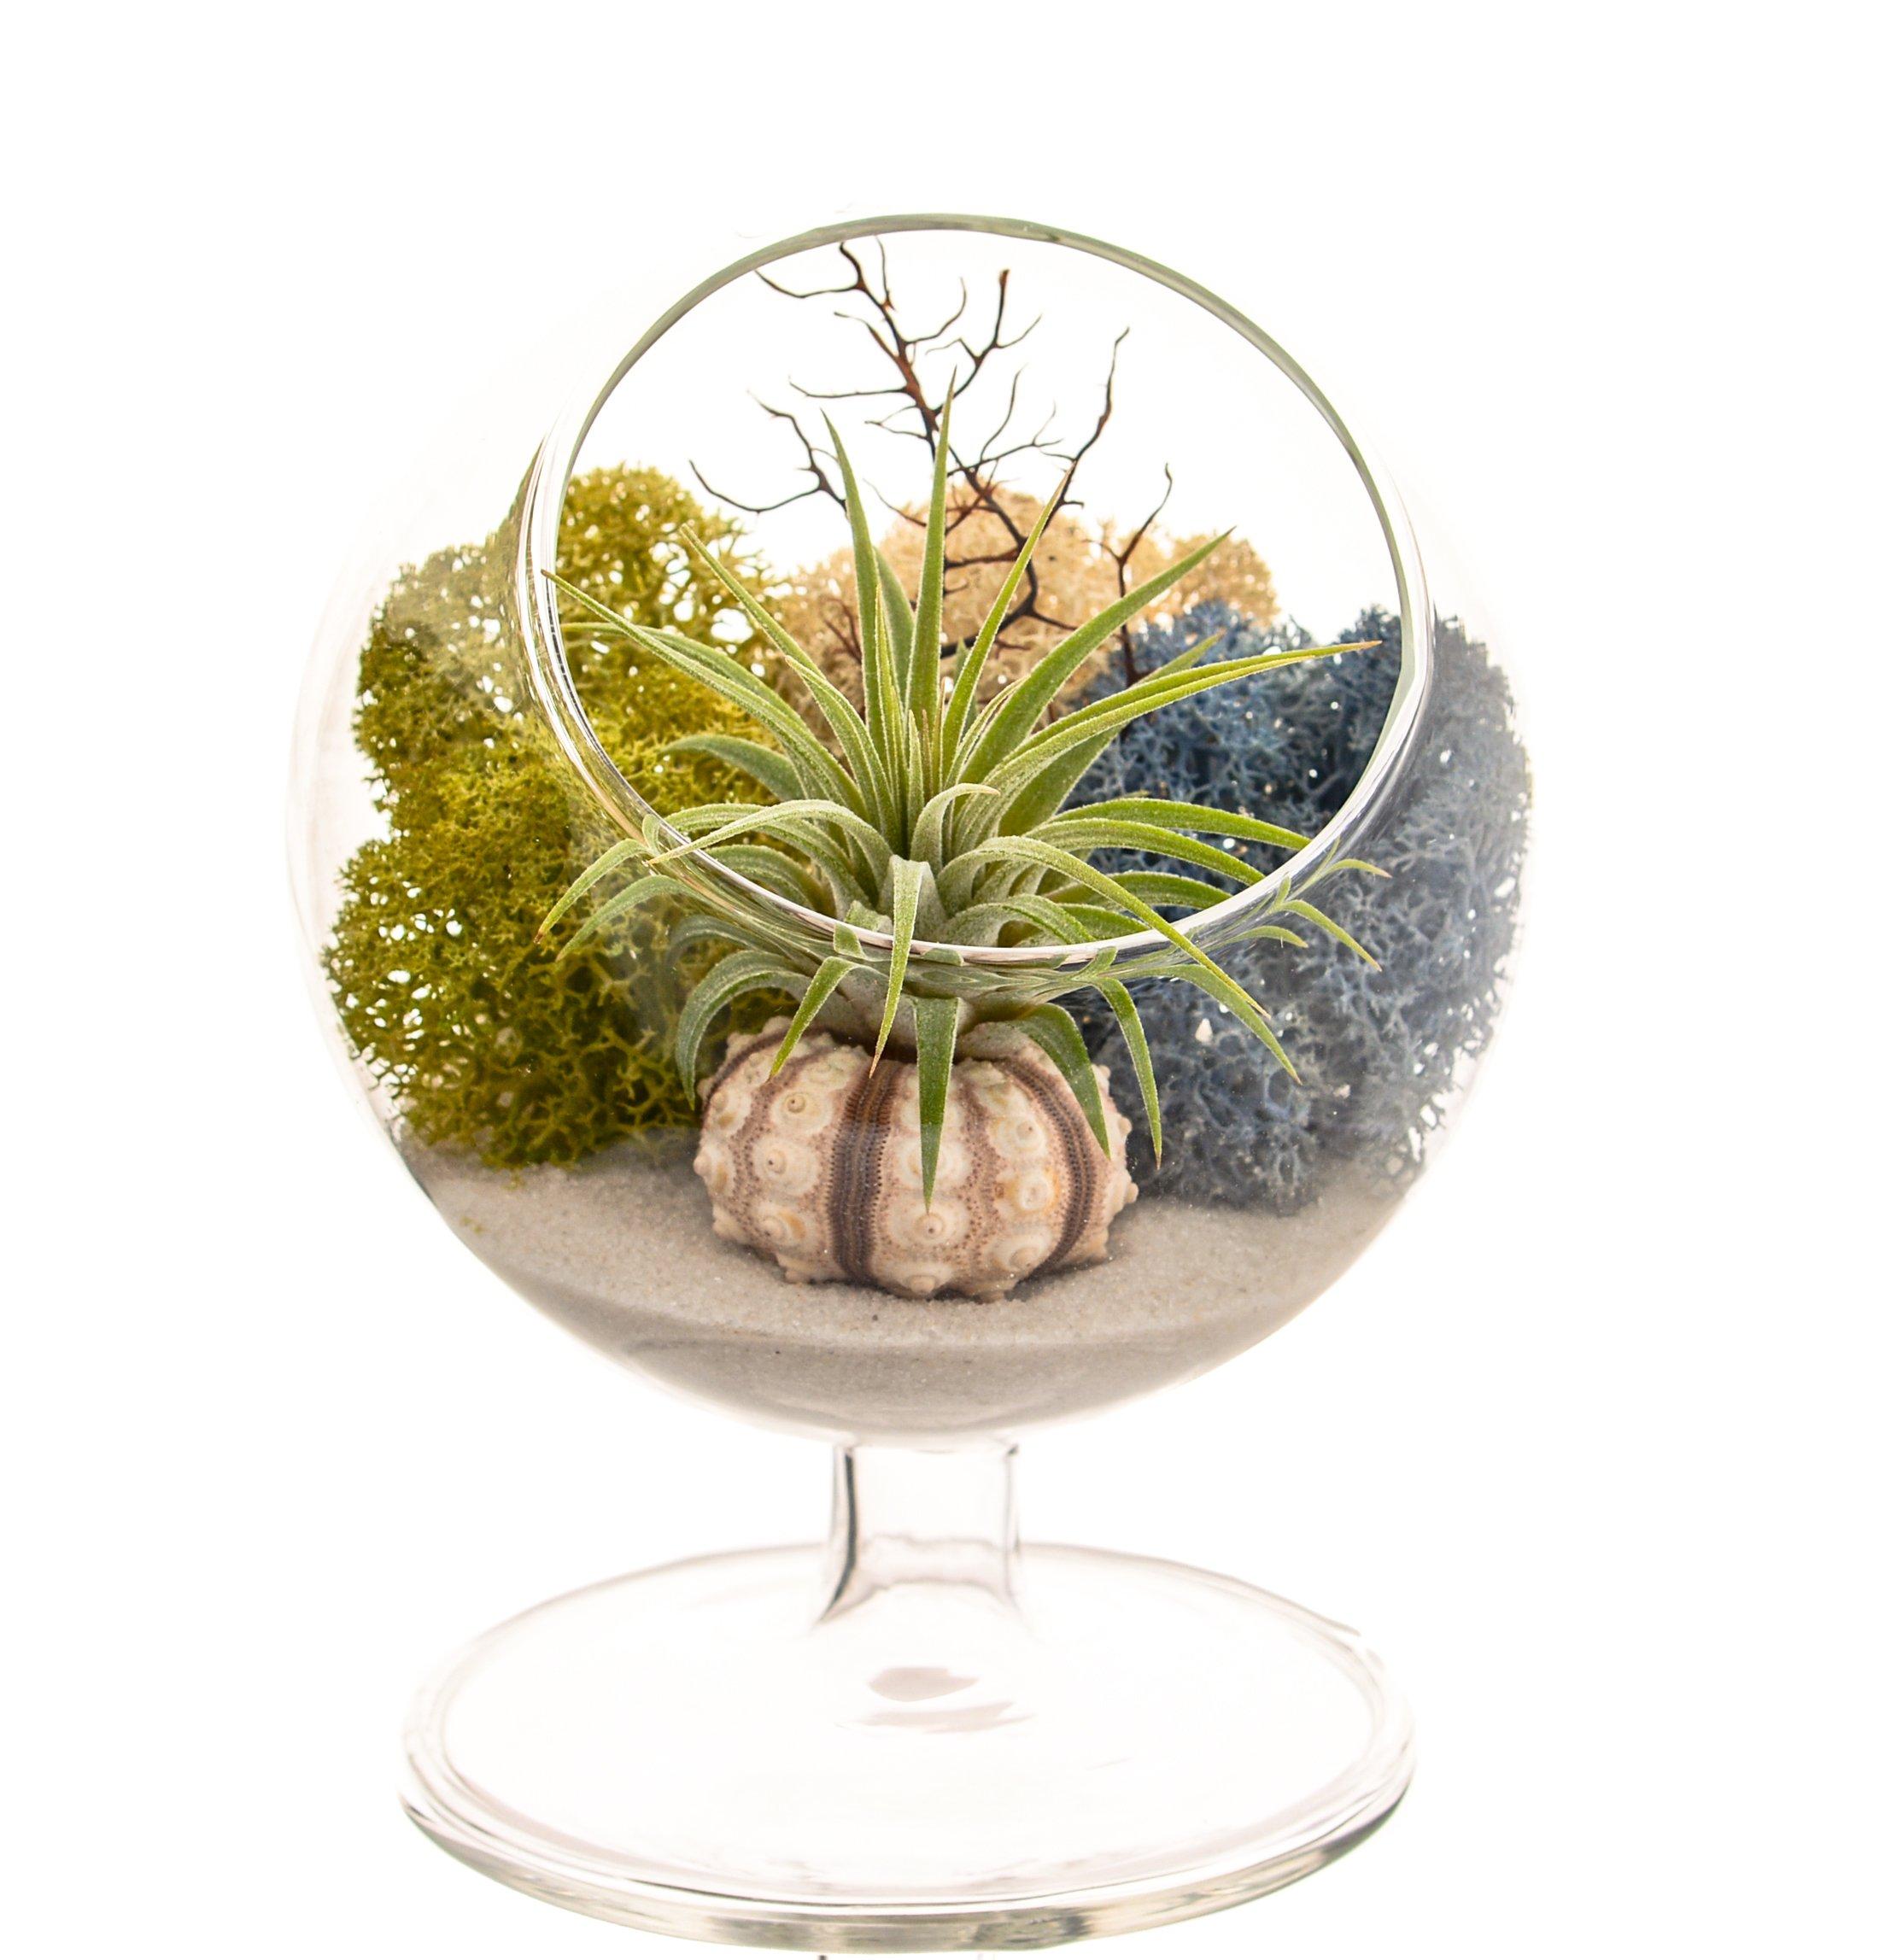 Bliss Gardens Air Plant Terrarium/4'' Round Glass Pedestal Kit/Multi Moss by Bliss Gardens